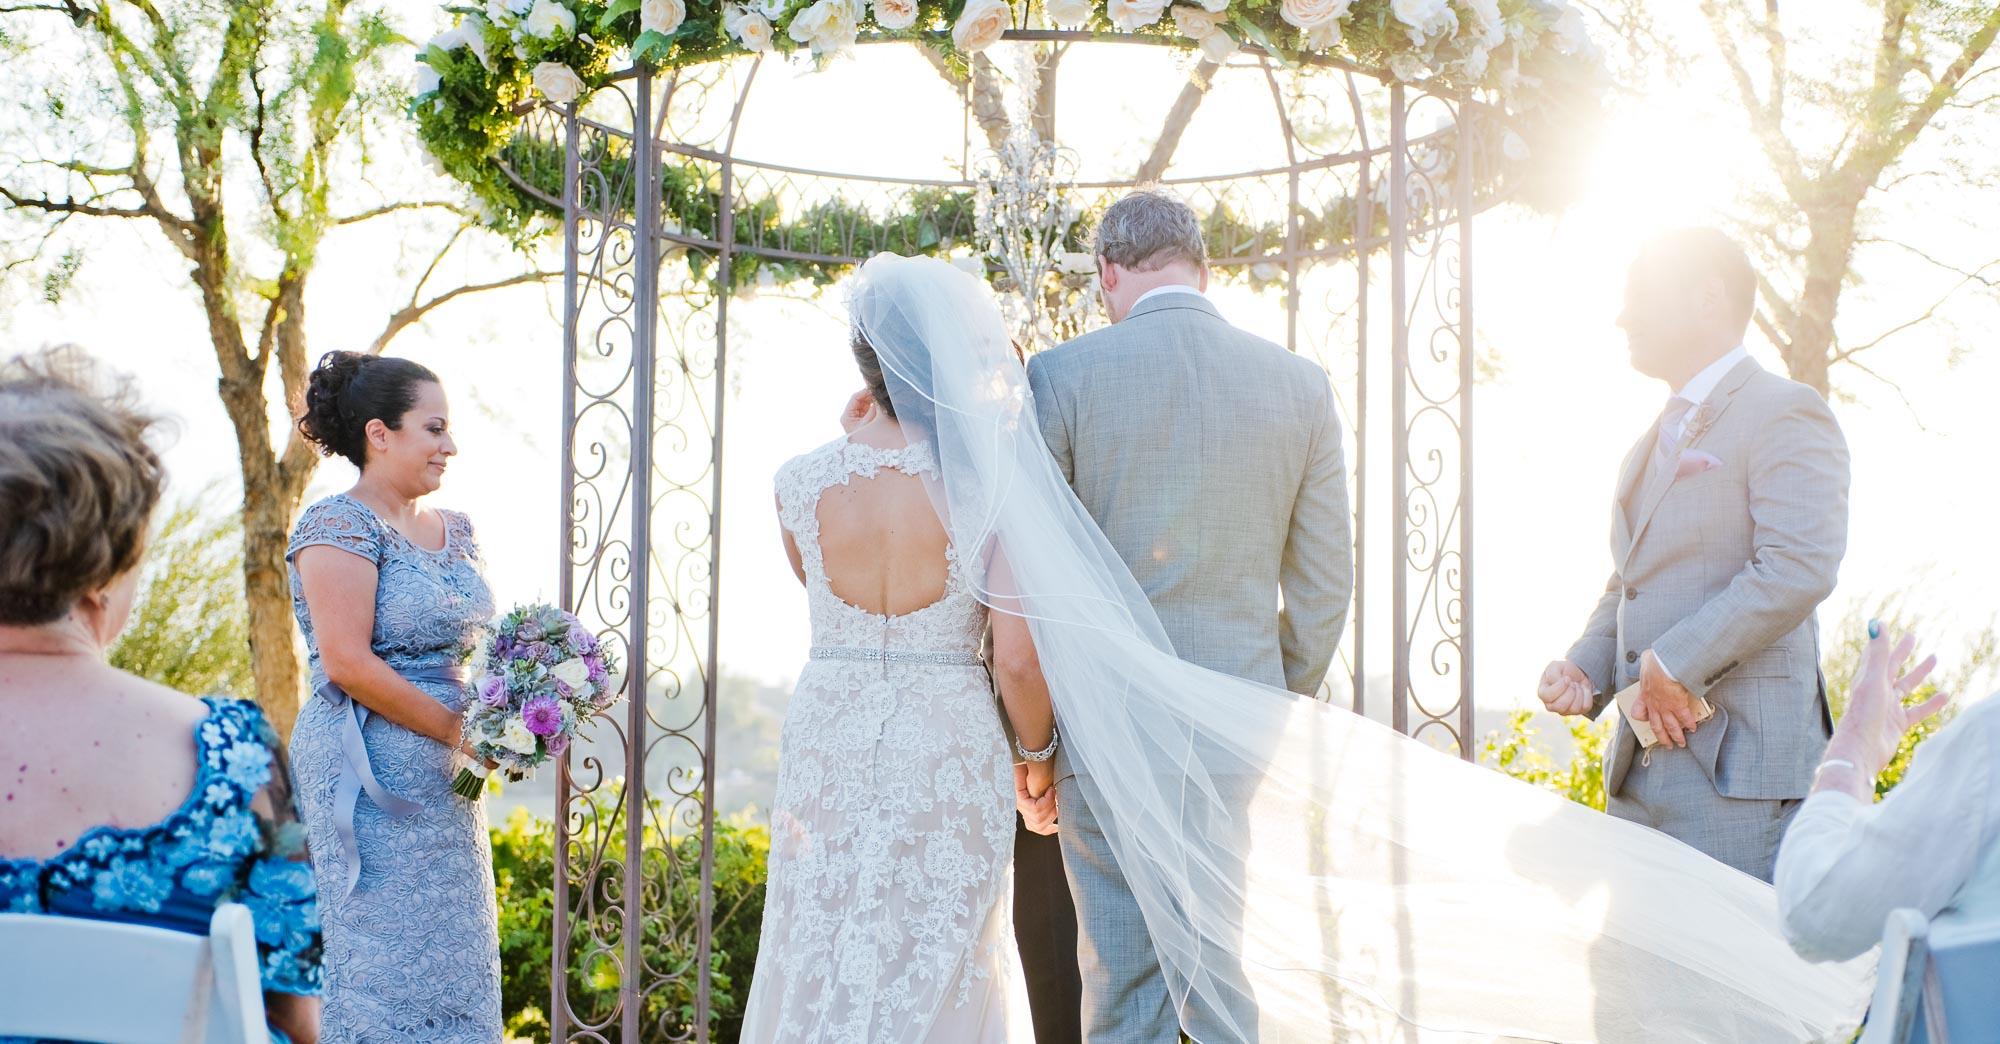 Lisa & Adam – Falkner Winery Wedding featured slider image